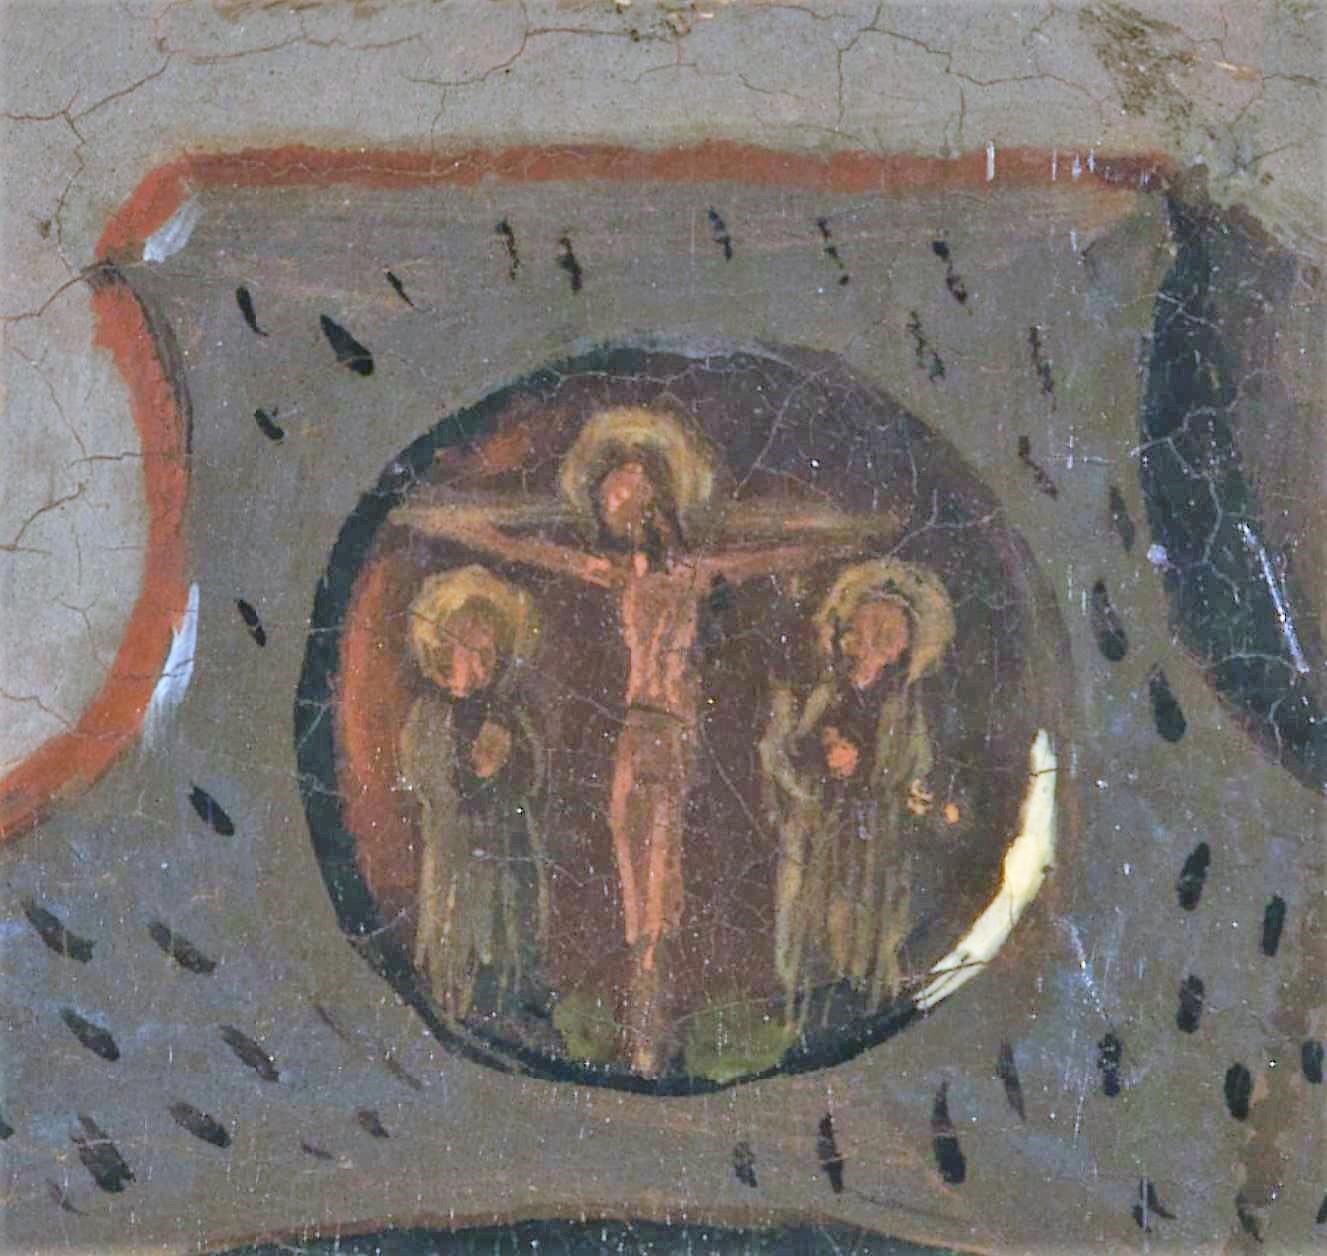 Van_Eyck 1434 _Arnolfini_Portrait miroir medaillon crucifixion